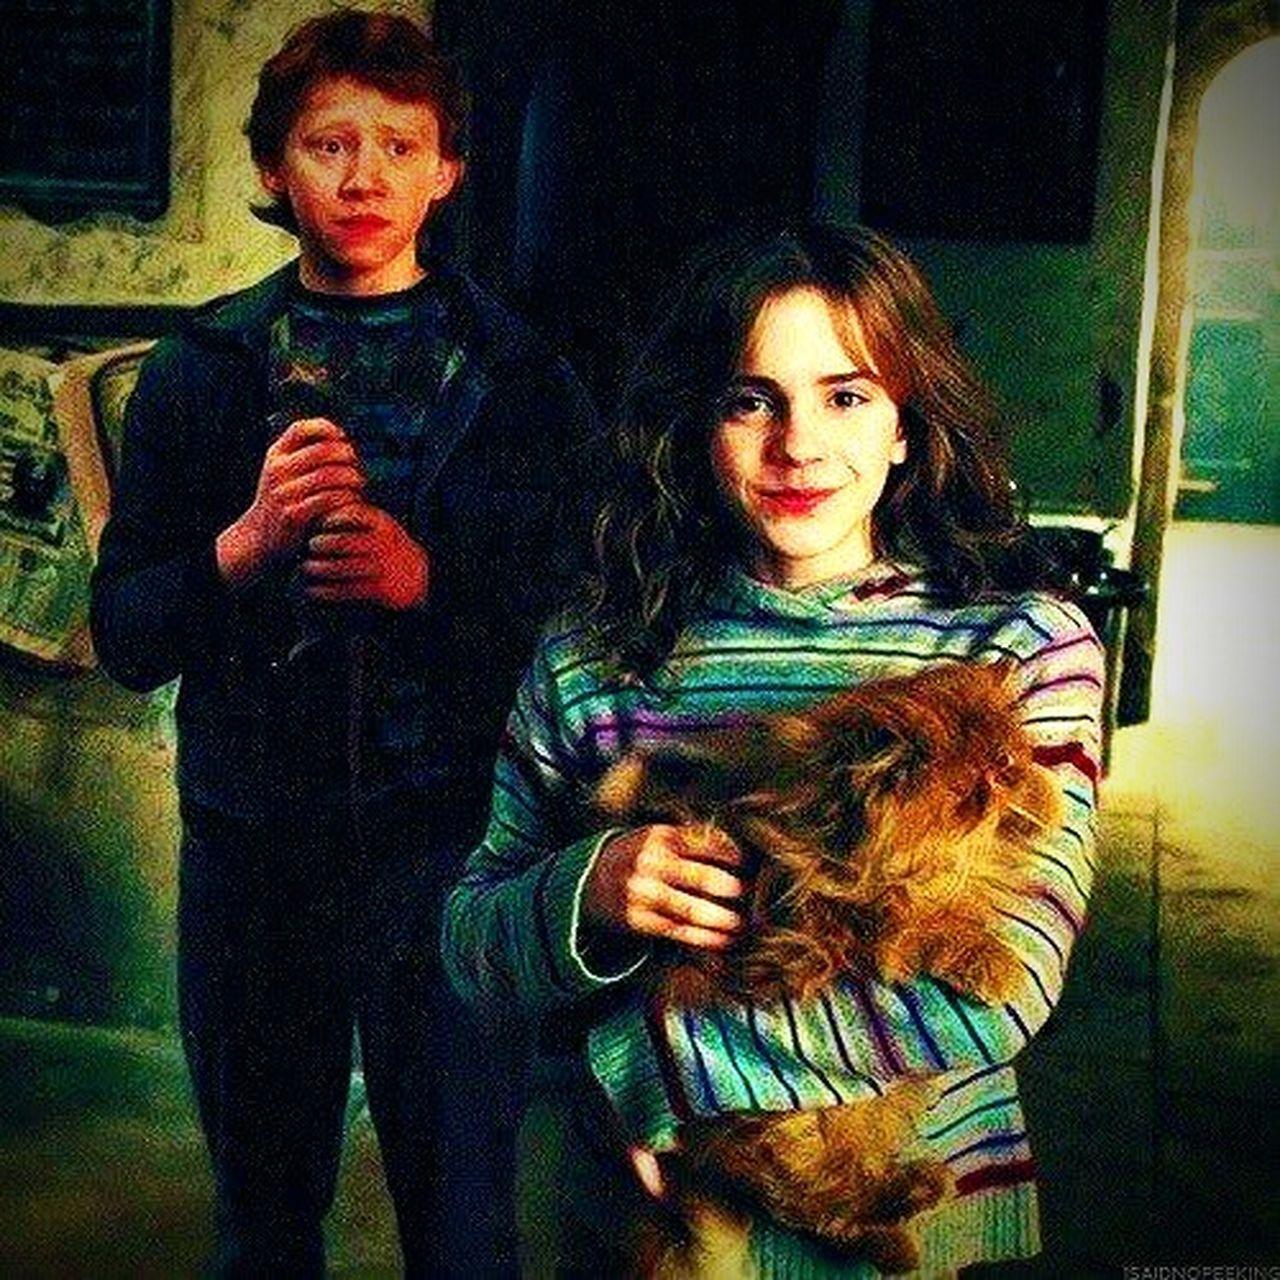 Harry Potter ⚡ Winner Winter Witcher Wich Gallery Huy Obama Trump Ebal Eball Zamudio Music Vape Gang Family ♥